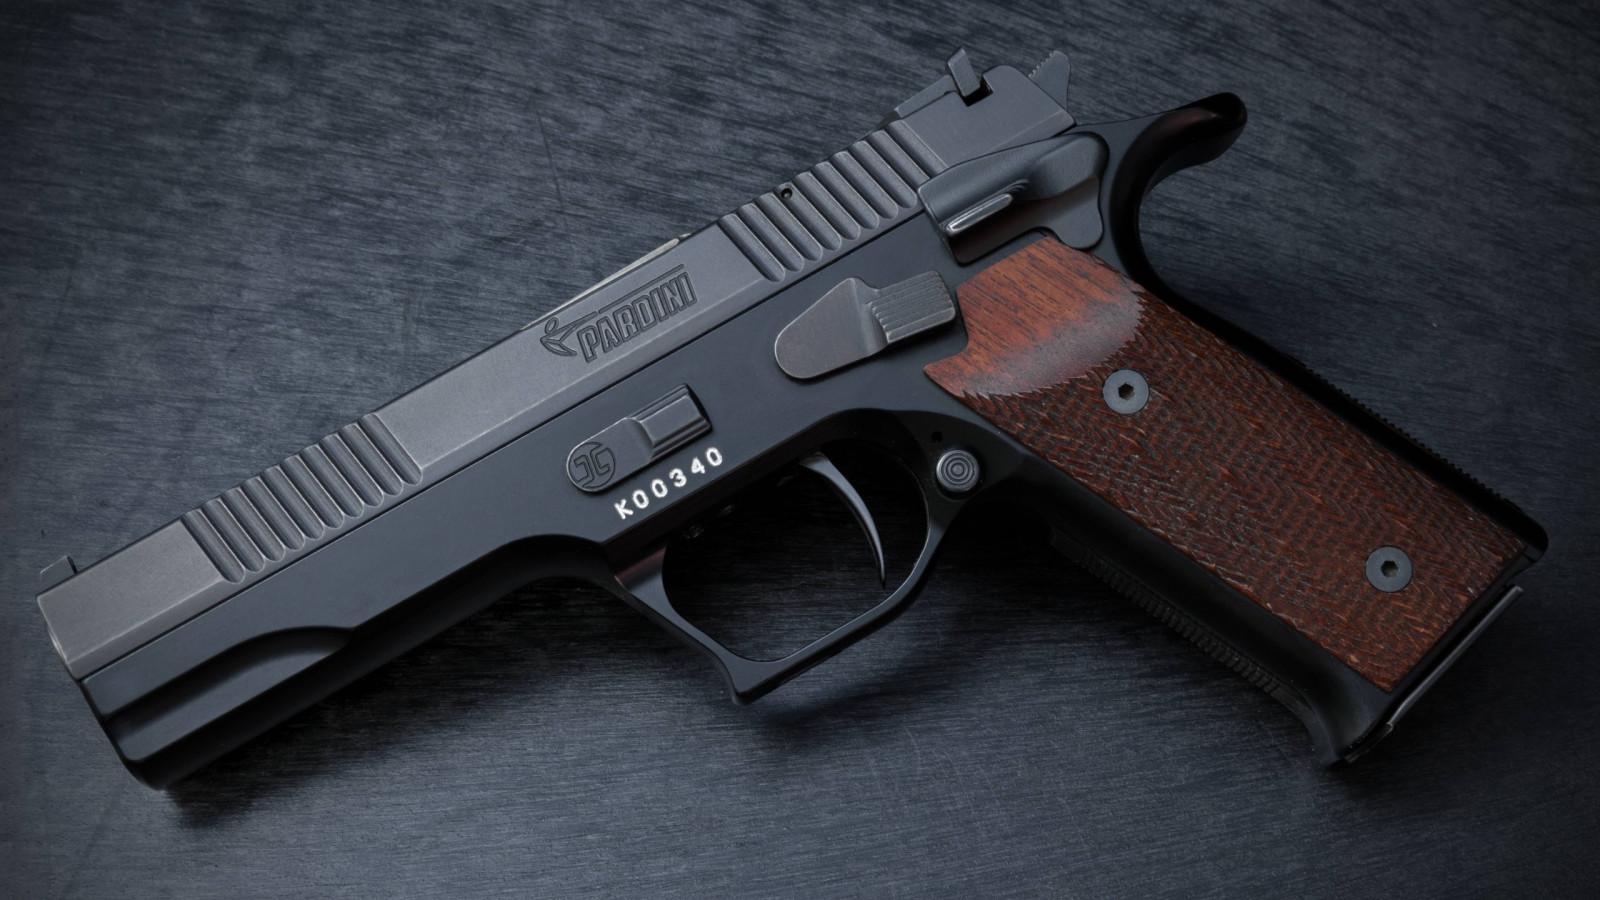 gun pistol pardini gt9 sporting pistol target pistol